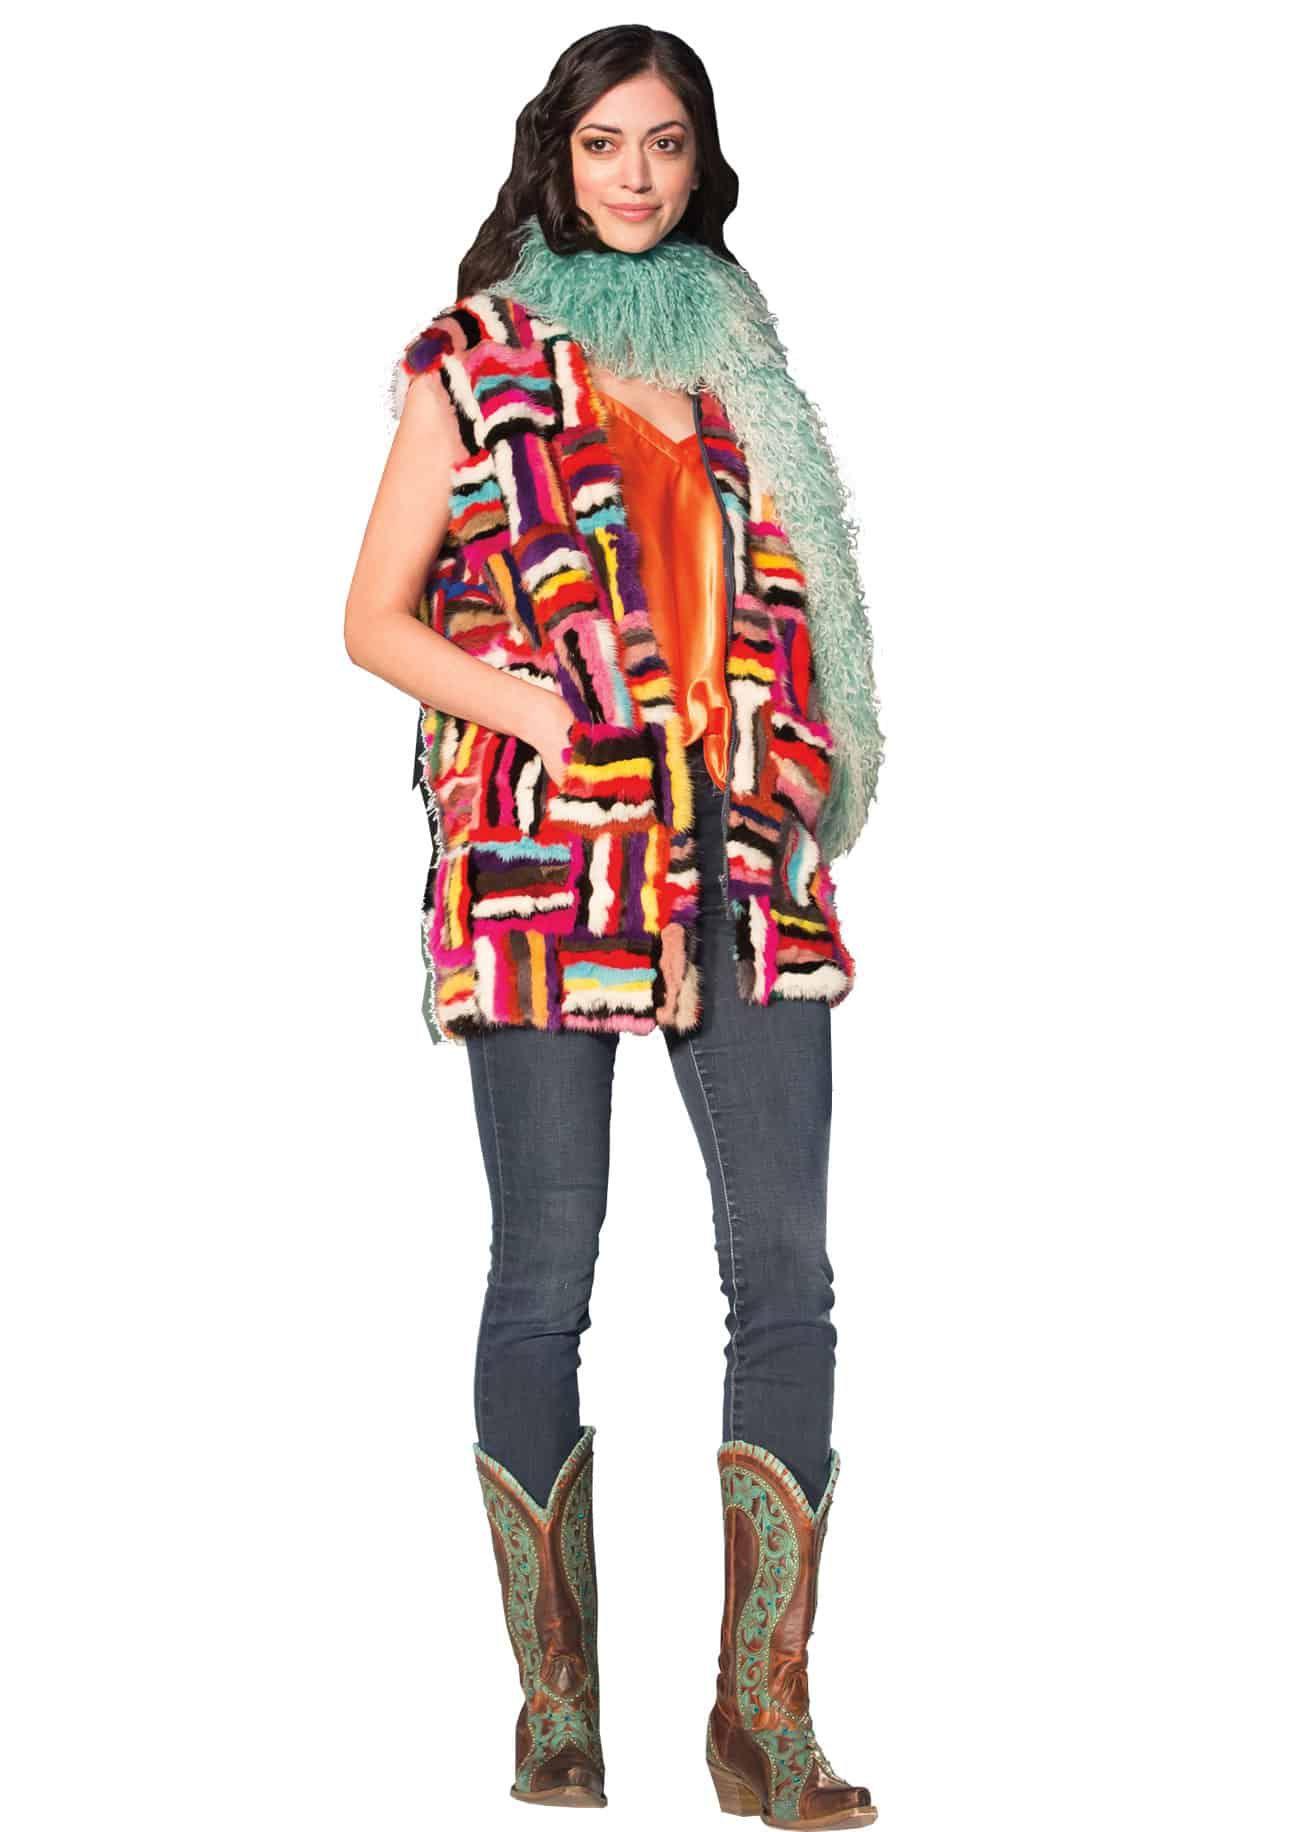 Bright Color Style Cowgirl Magazine